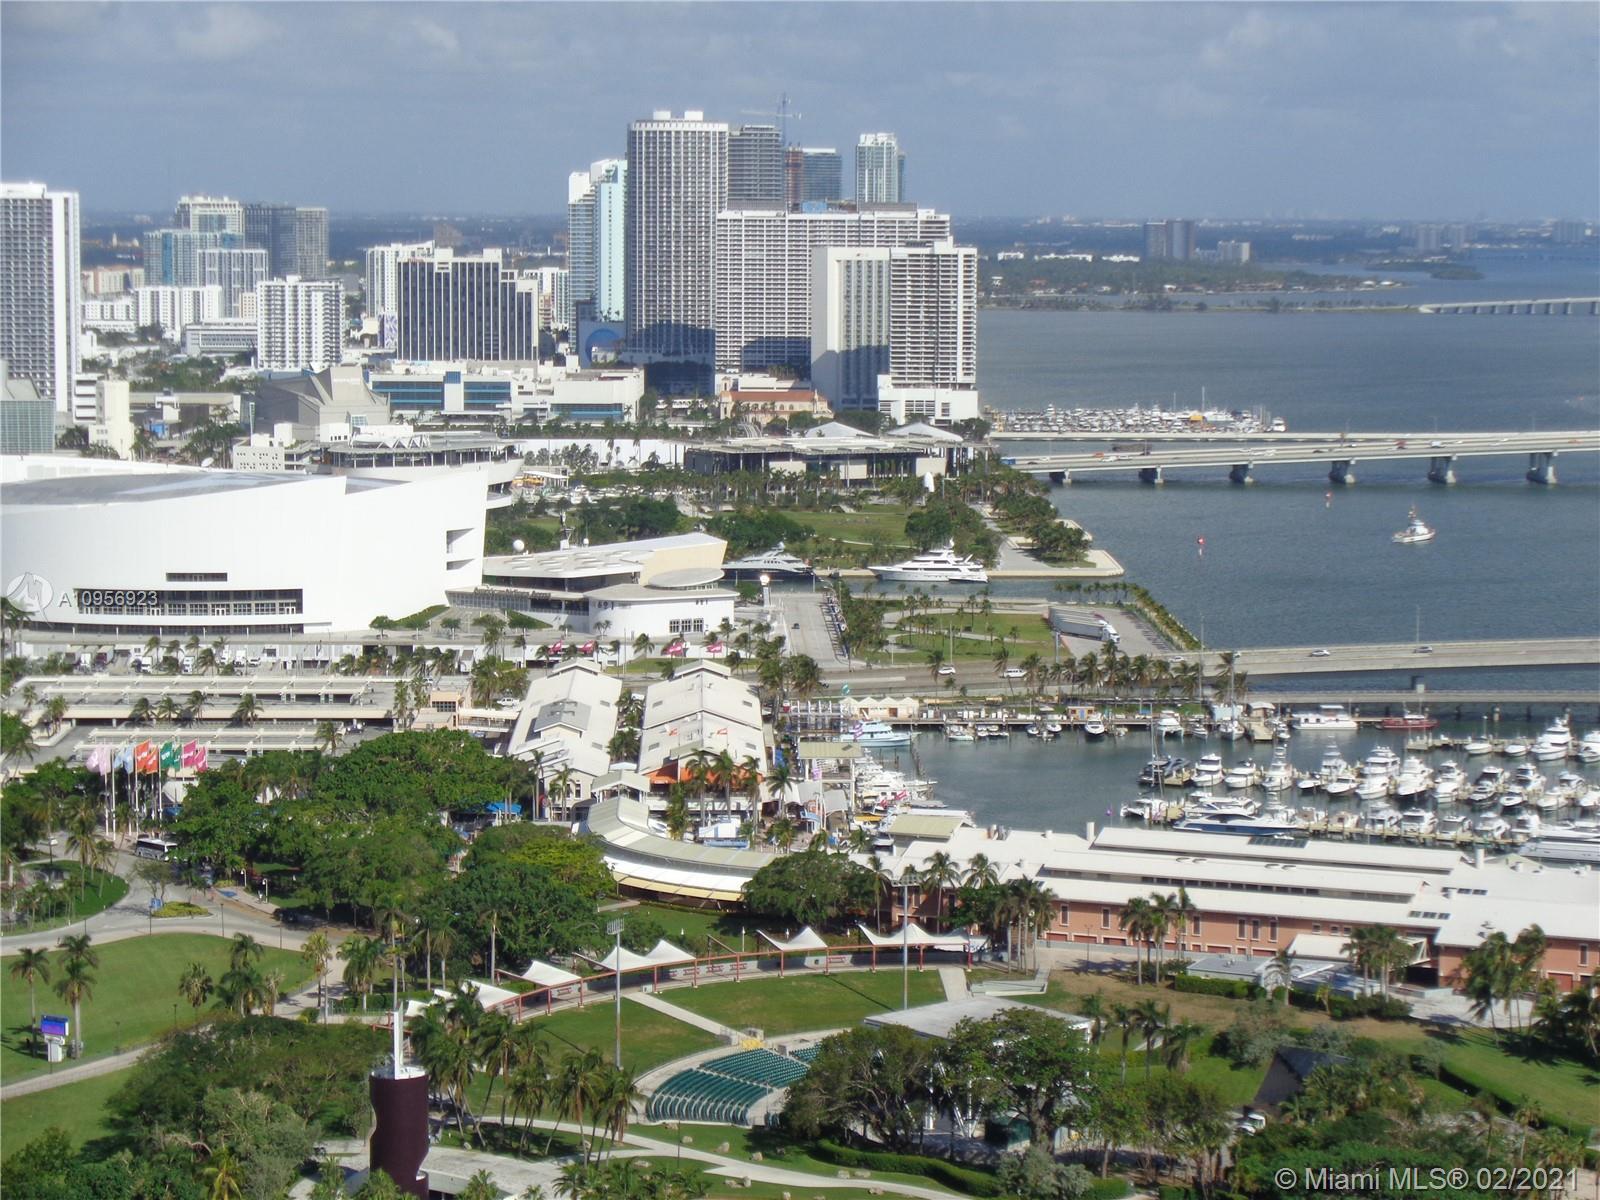 One Miami West #4318 - 325 S Biscayne Blvd #4318, Miami, FL 33131